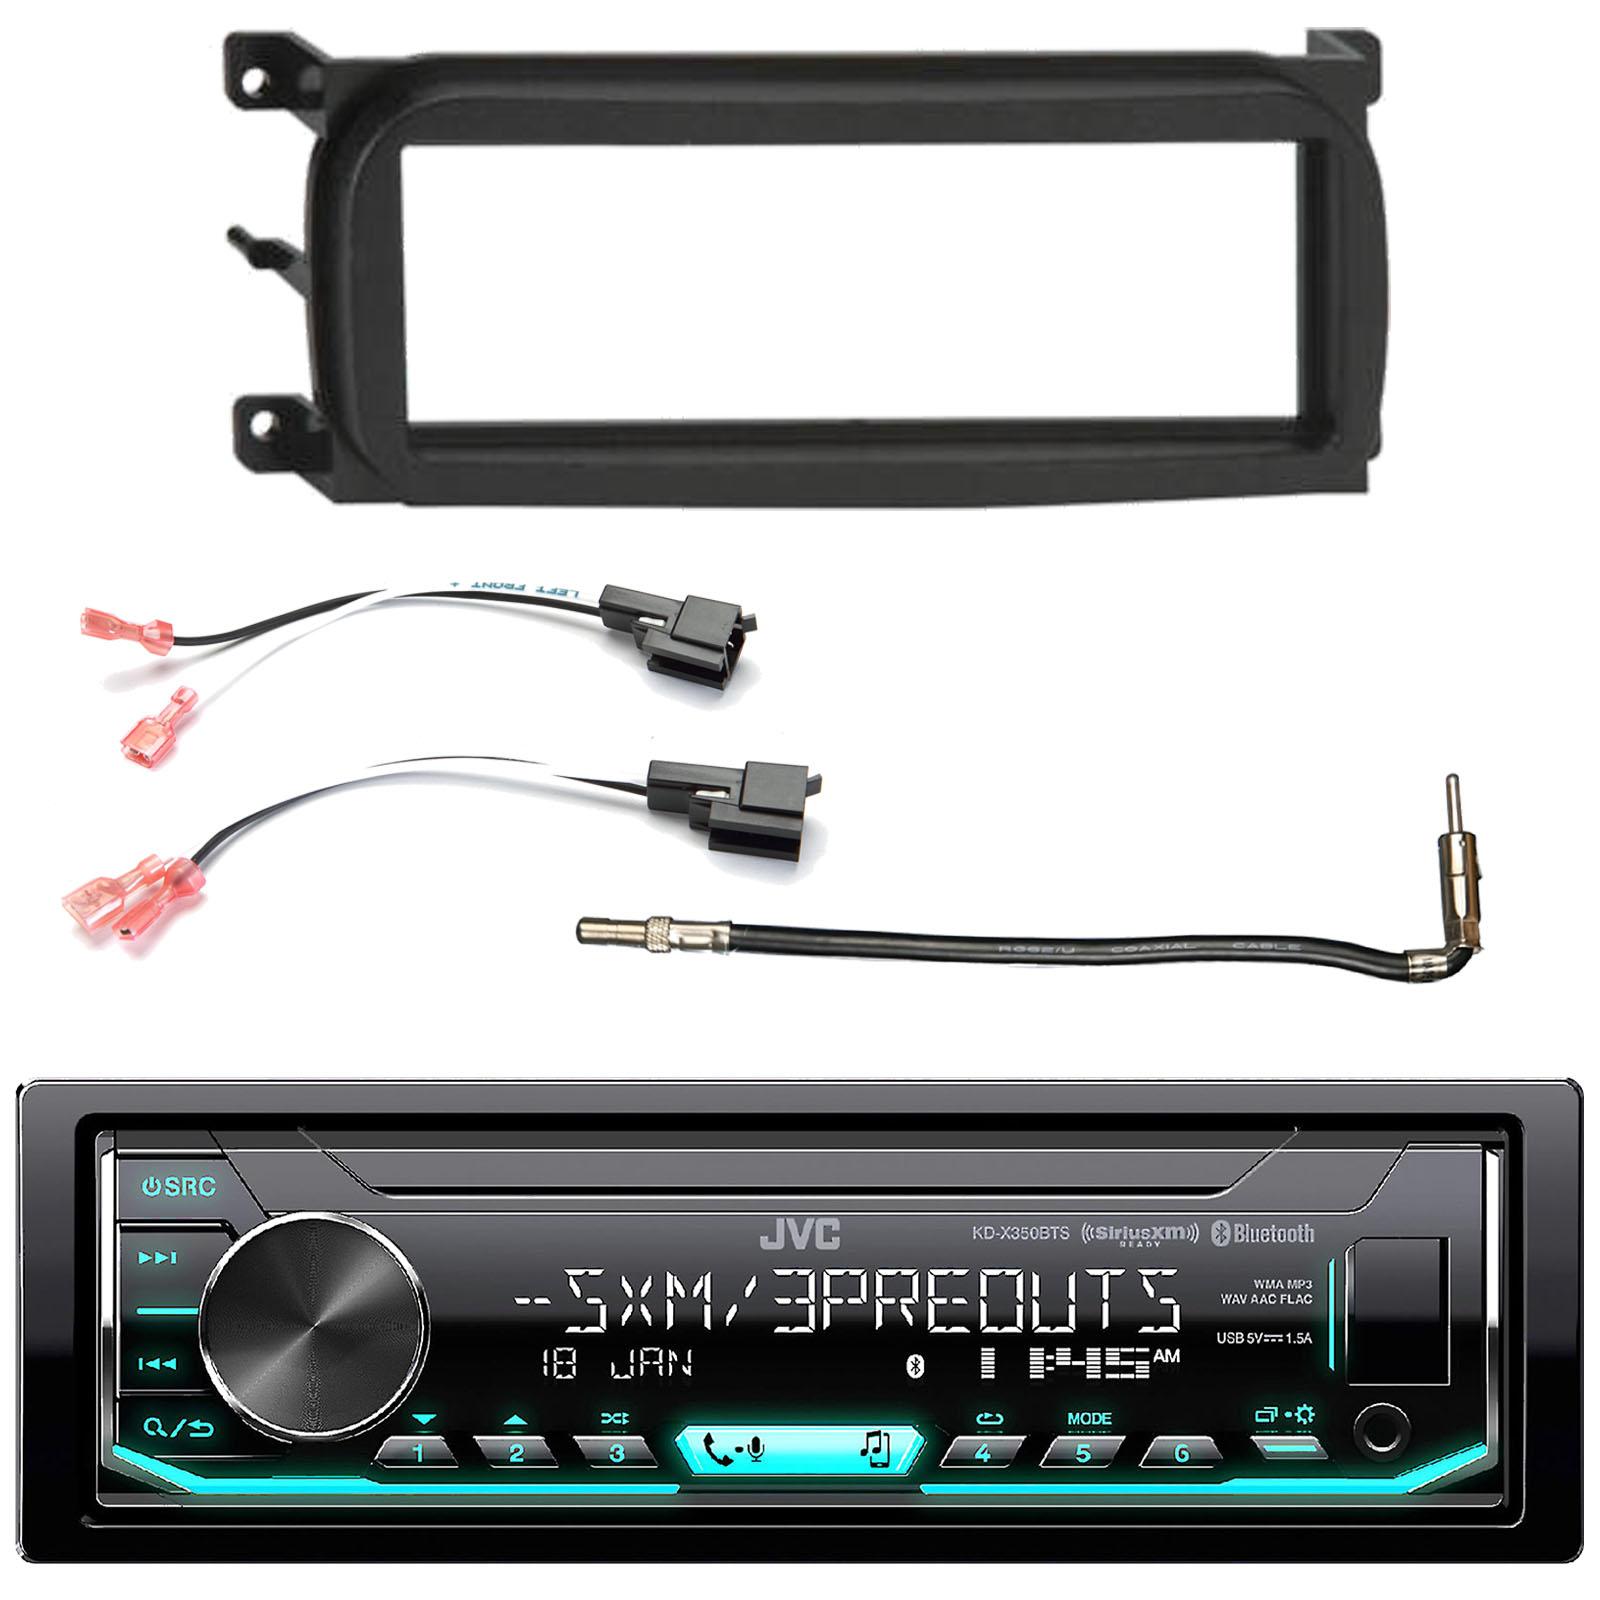 JVC KD-X350BTS Single-Din Car Digital Media Bluetooth Receiver, USB/AUX/SiriusXM, Enrock Single-DIN Dash Kit, Metra 2 Pin Rectangular Speaker Connector, Metra Antenna Adapter Cable